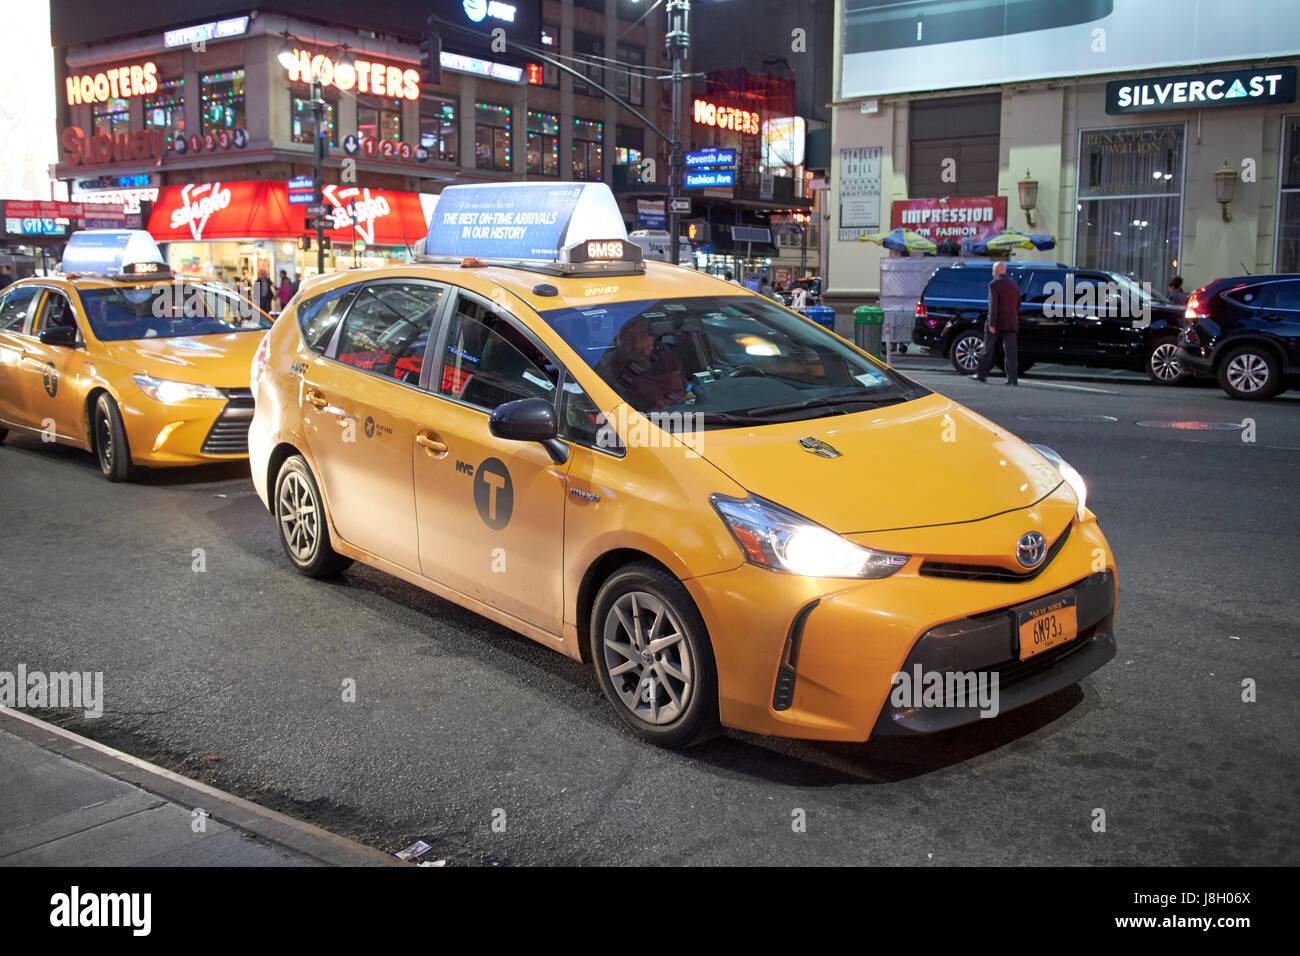 Toyota prius v hybrid new york city yellow cab at night in midtown usa stock